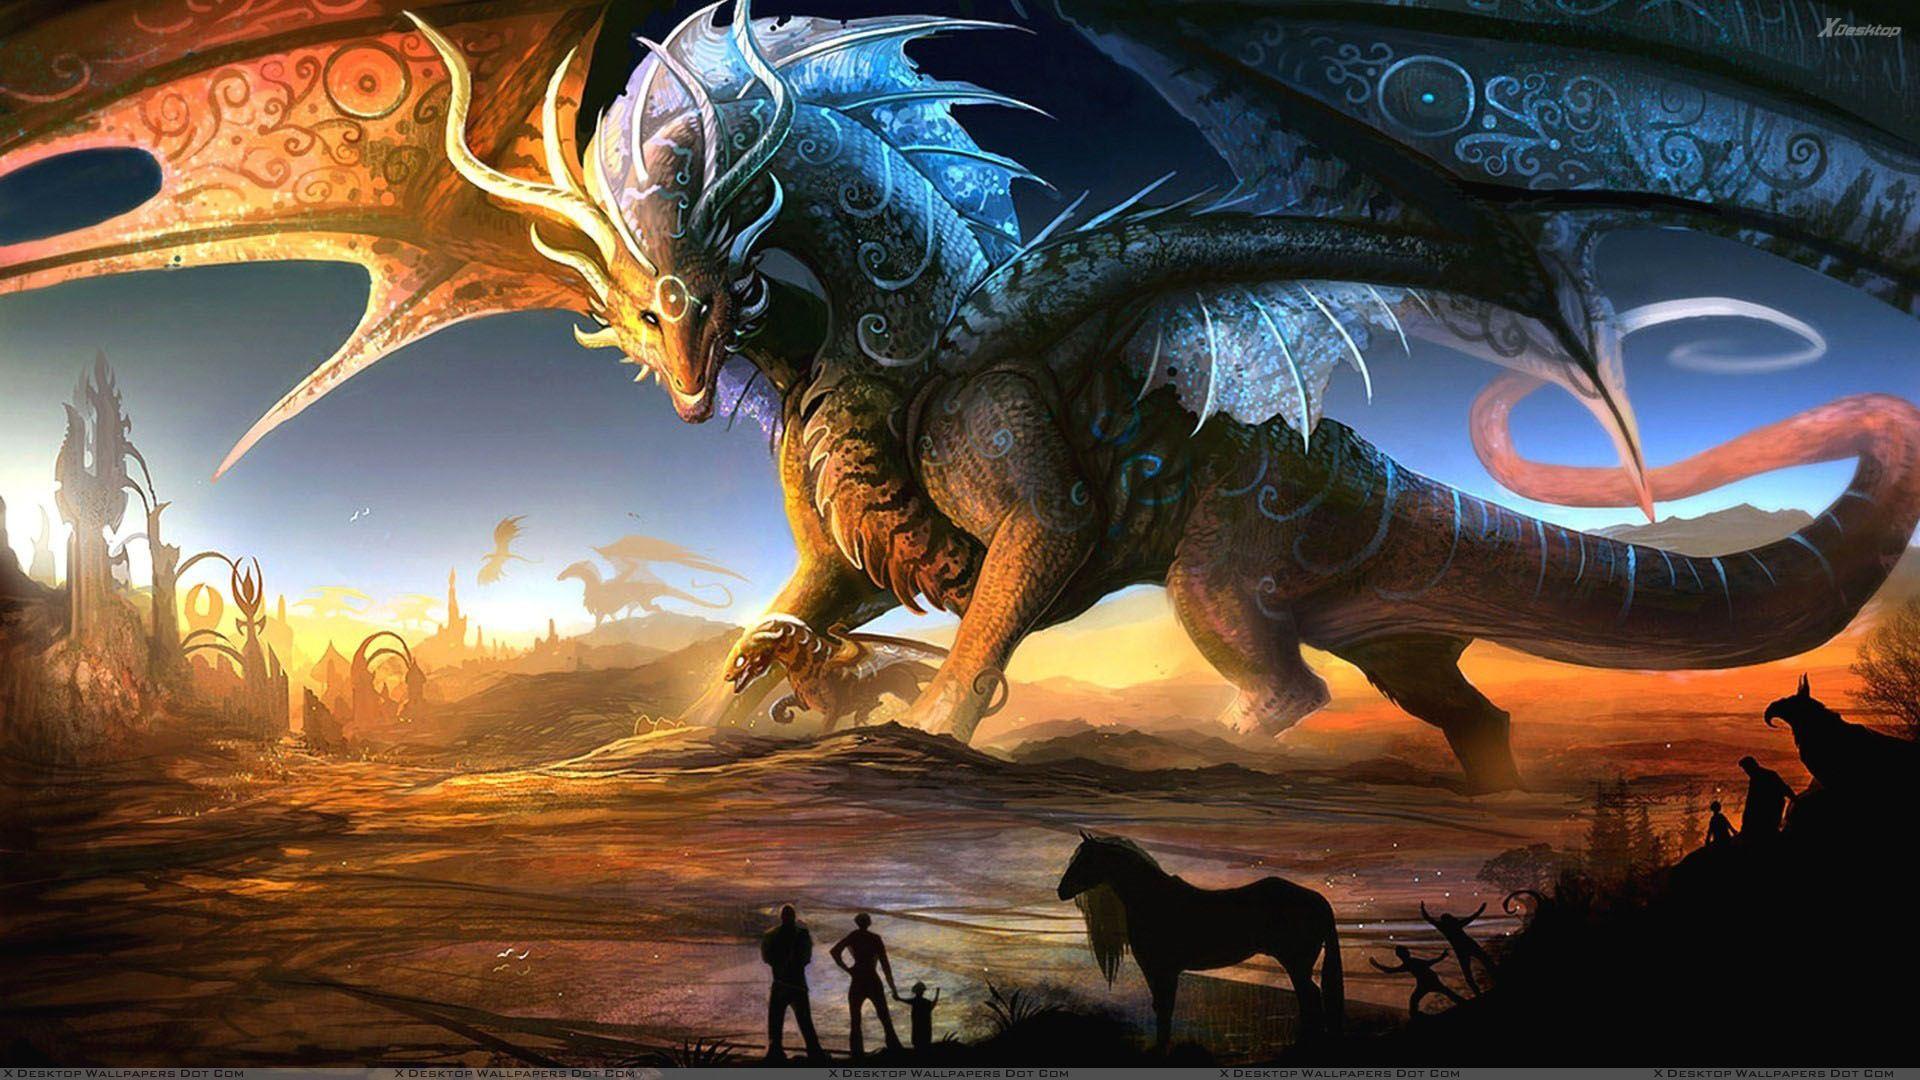 Dragon Fantasy Art Wallpaper 1920x1080